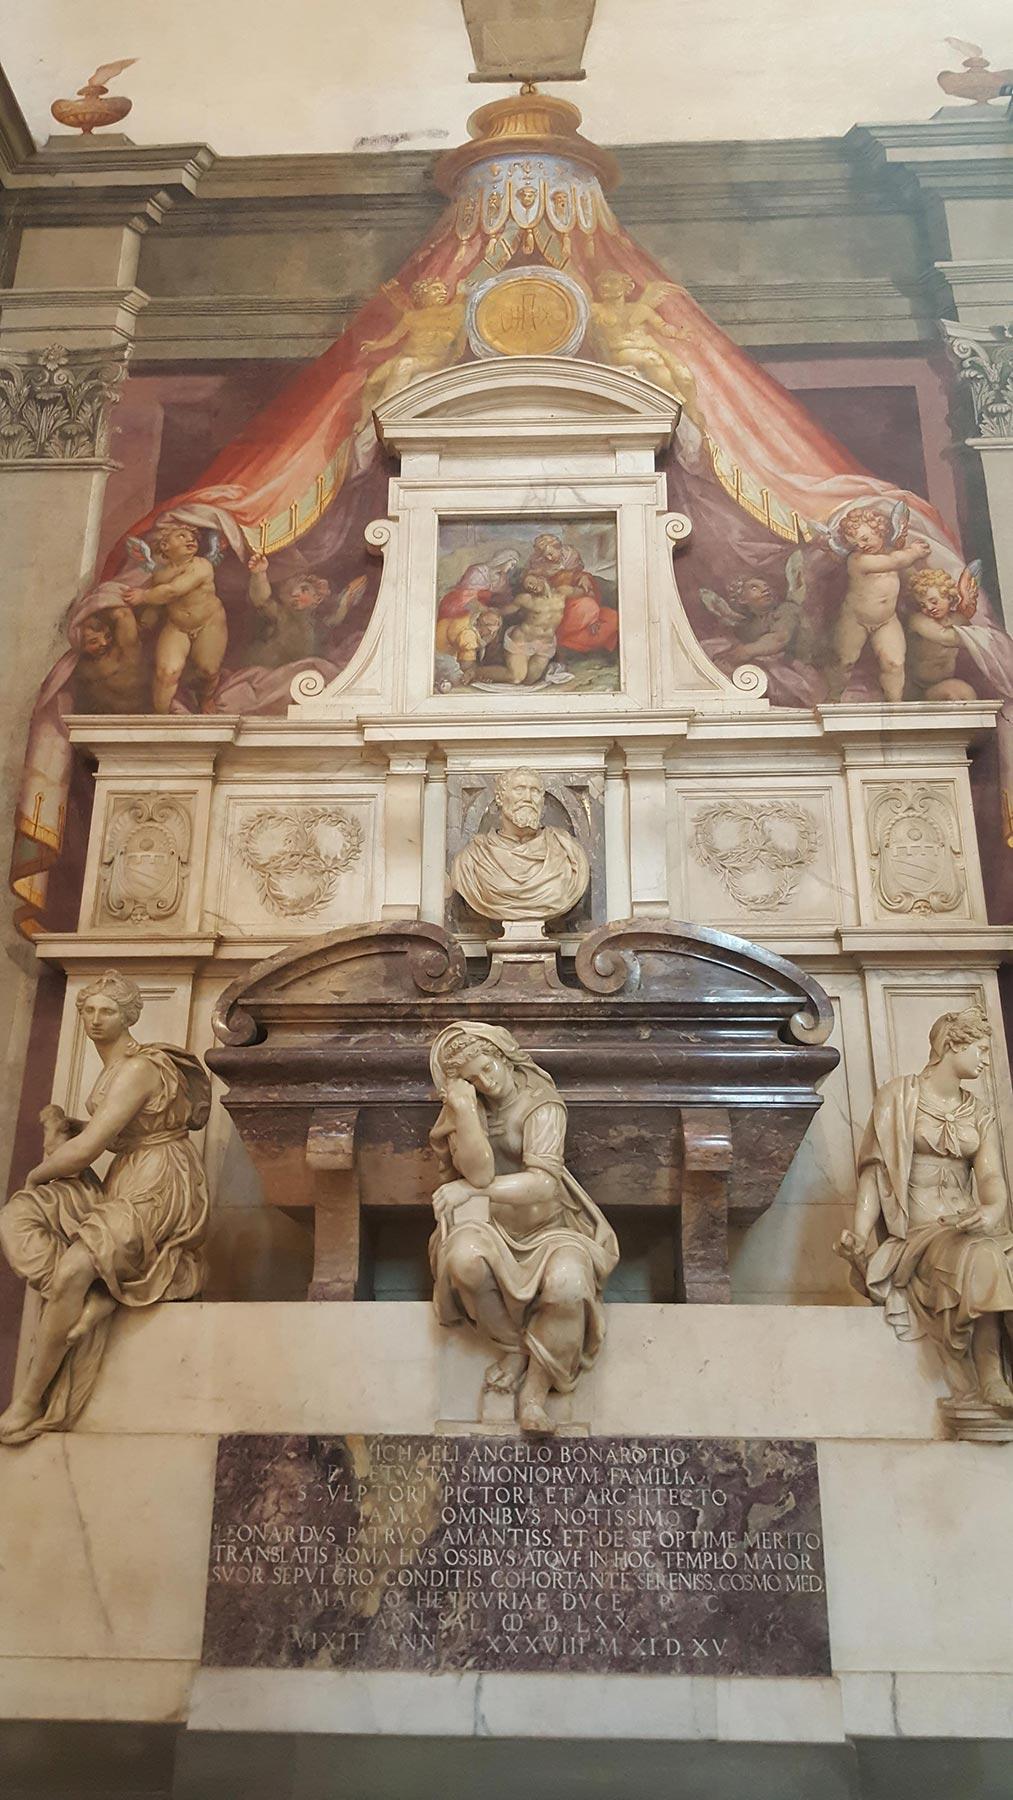 Church of Santa Croce, where Michelangelo is buried